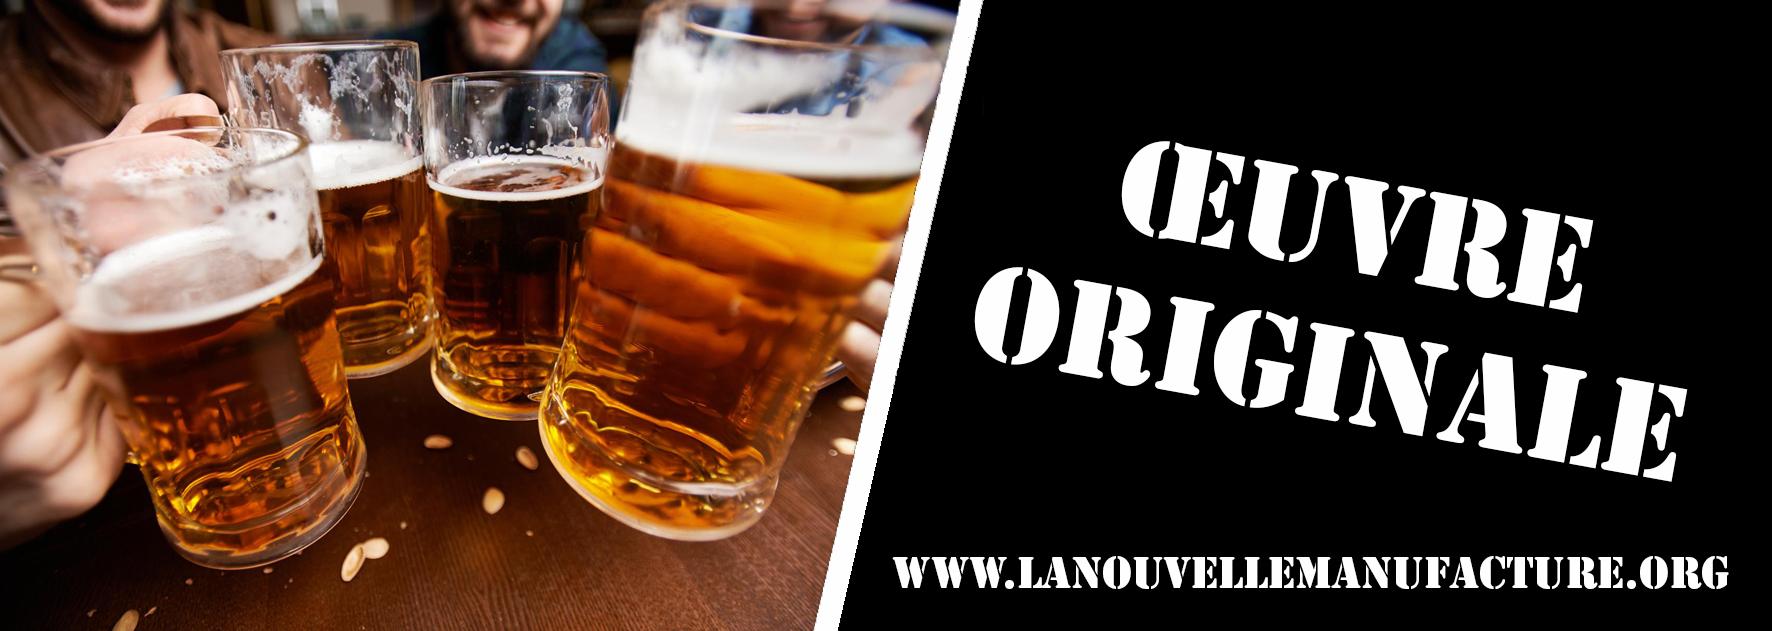 bier_oeuvre-1510150475.jpg